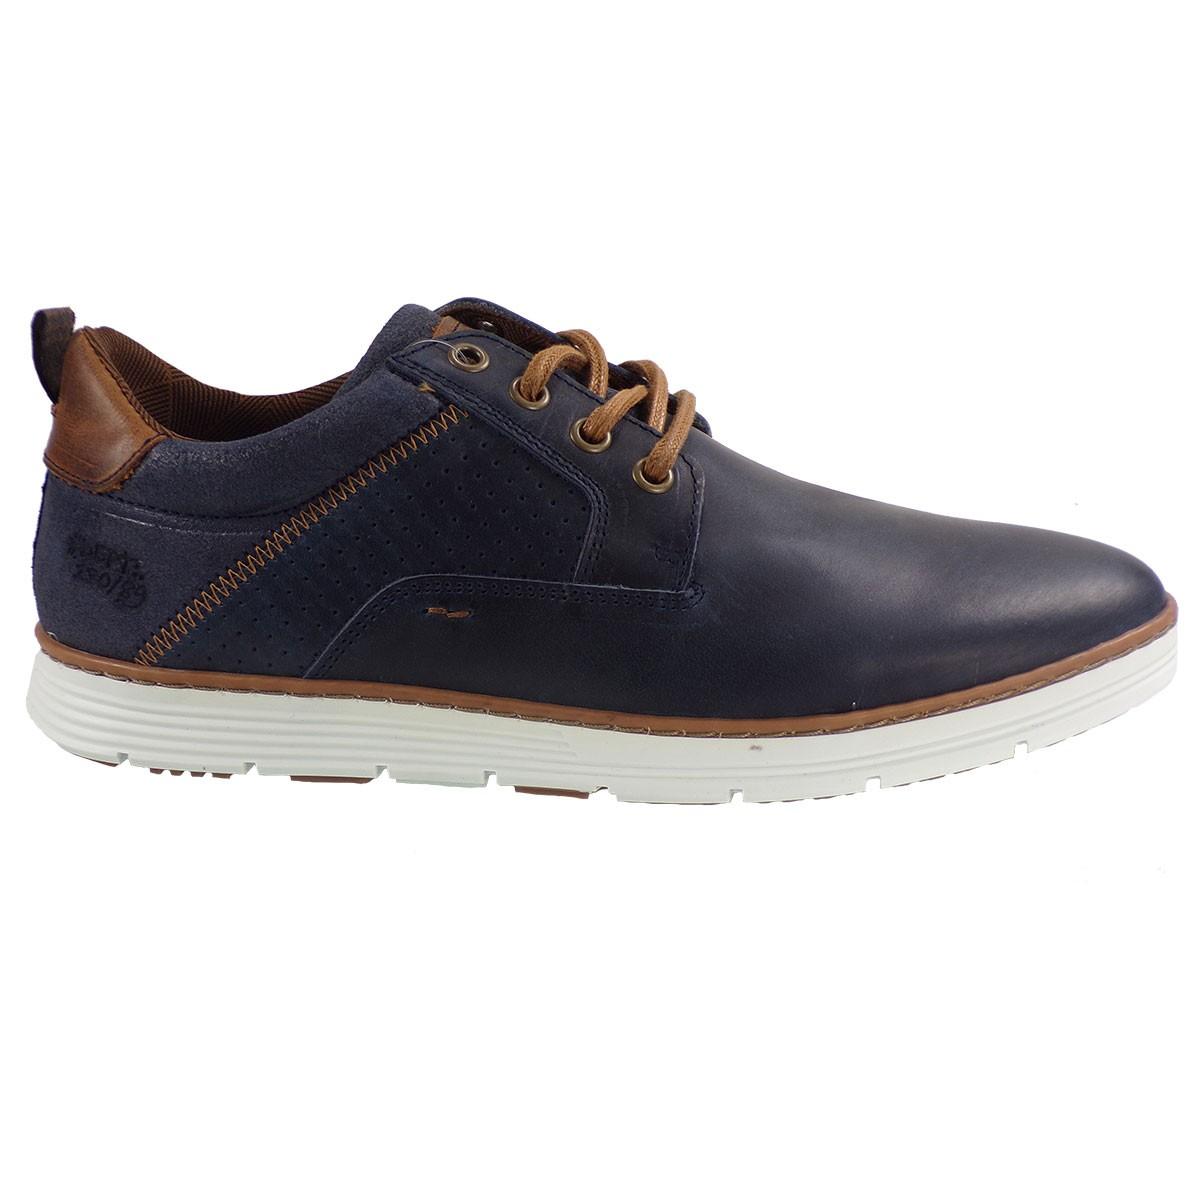 fd244cd3220 Bullboxer Ανδρικά Παπούτσια Sneakers 628K20006 Mπλέ Δέρμα ...